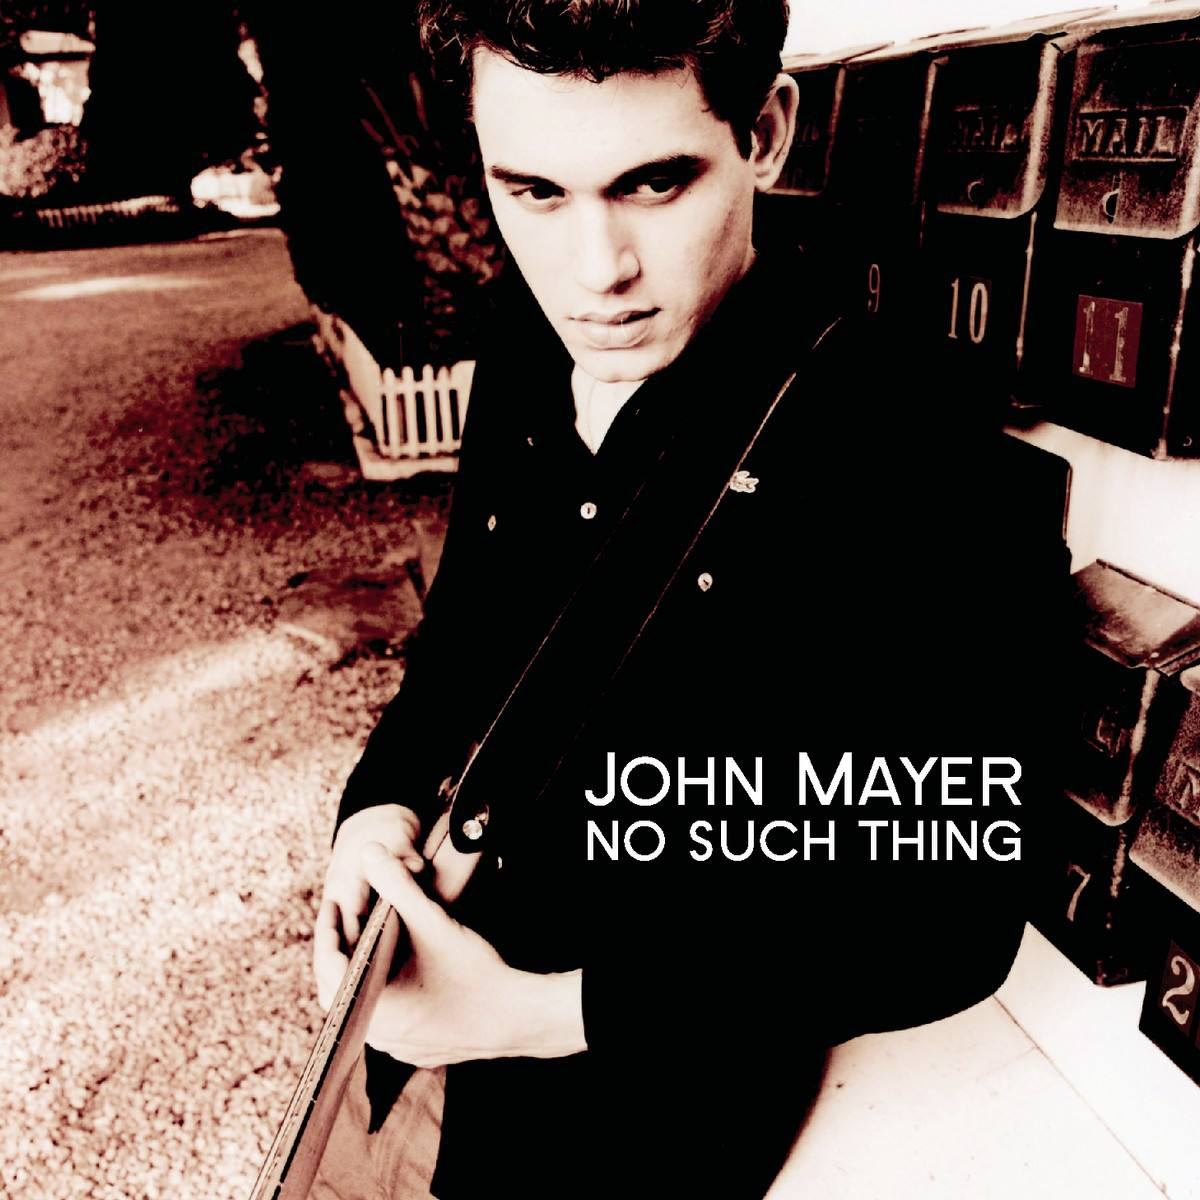 John Mayer No Such Thing